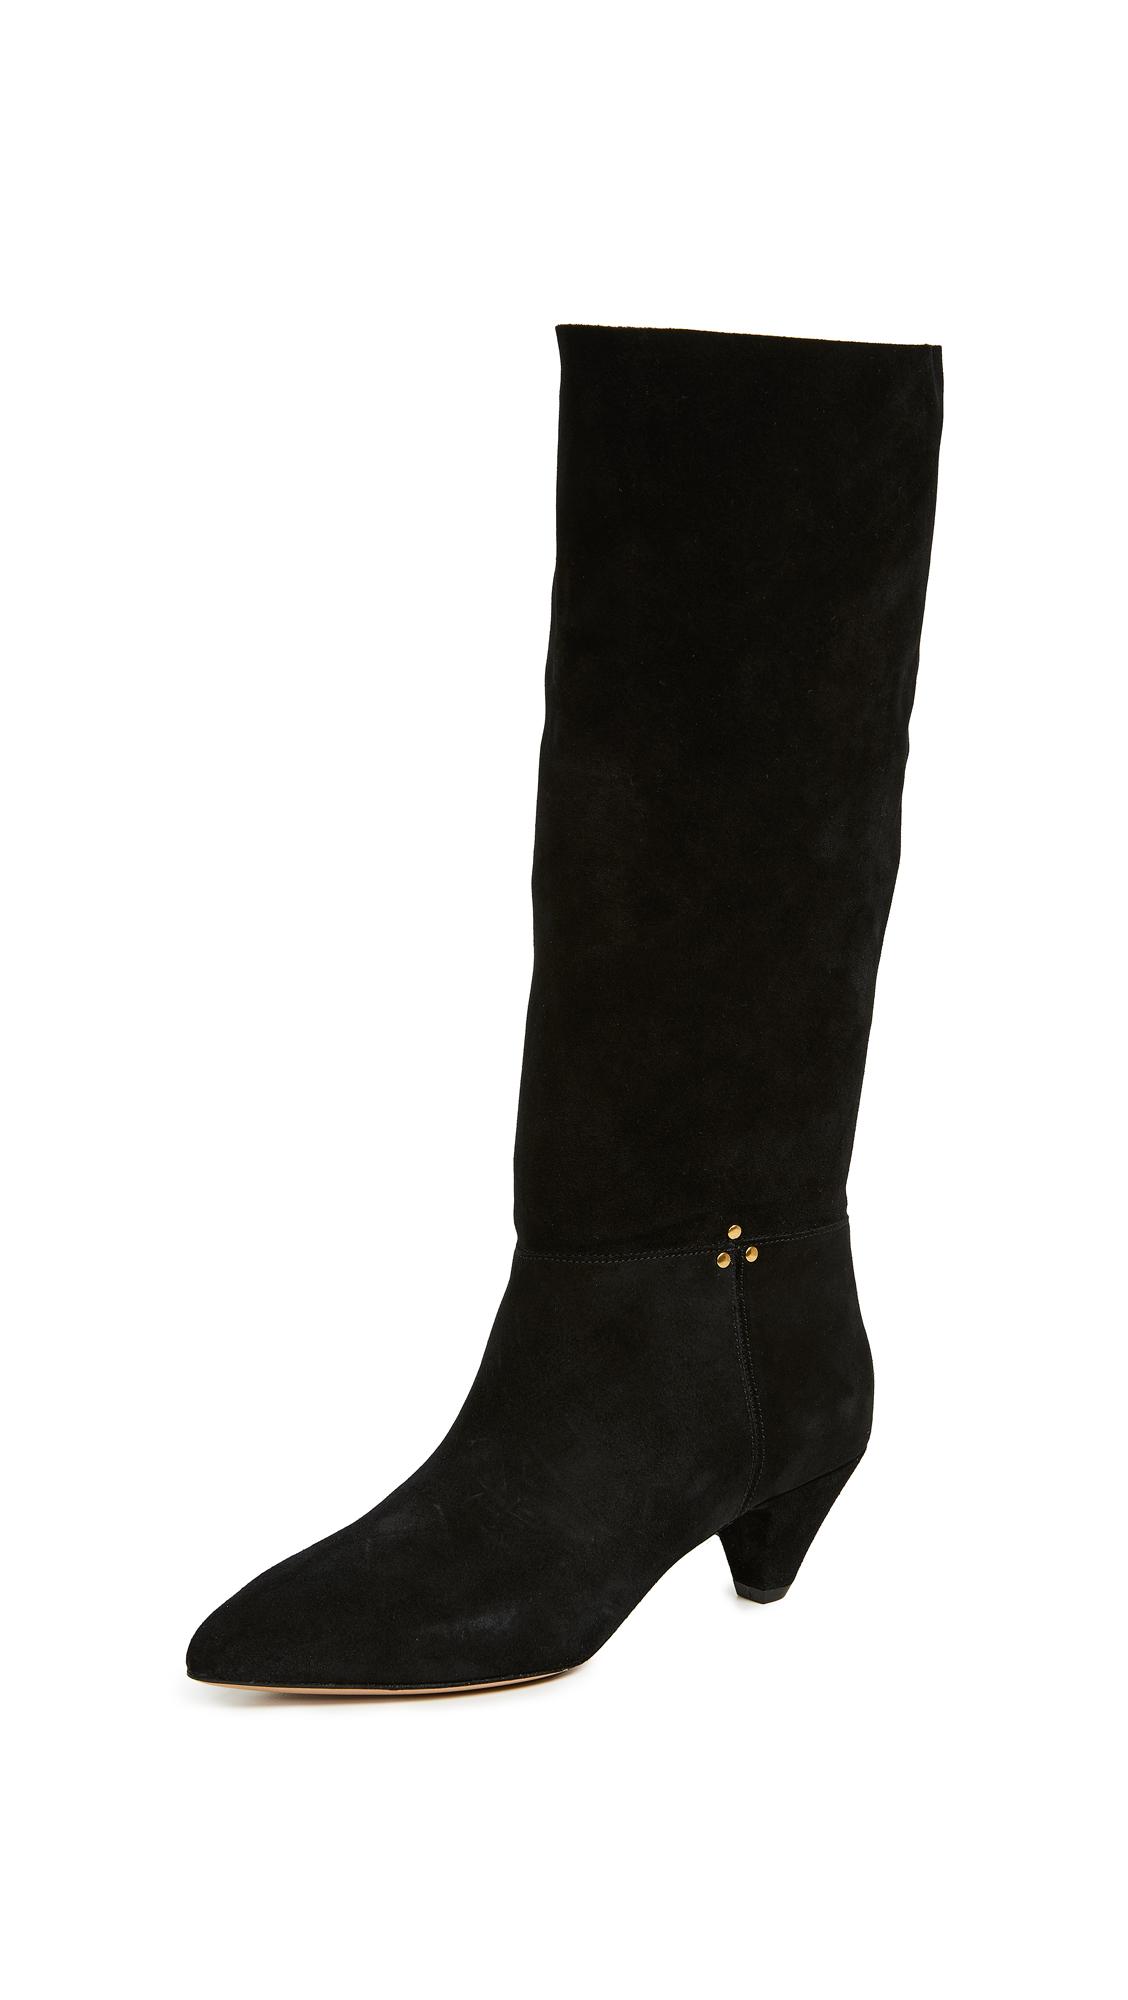 Jerome Dreyfuss Sandie 50mm Boots - Noir